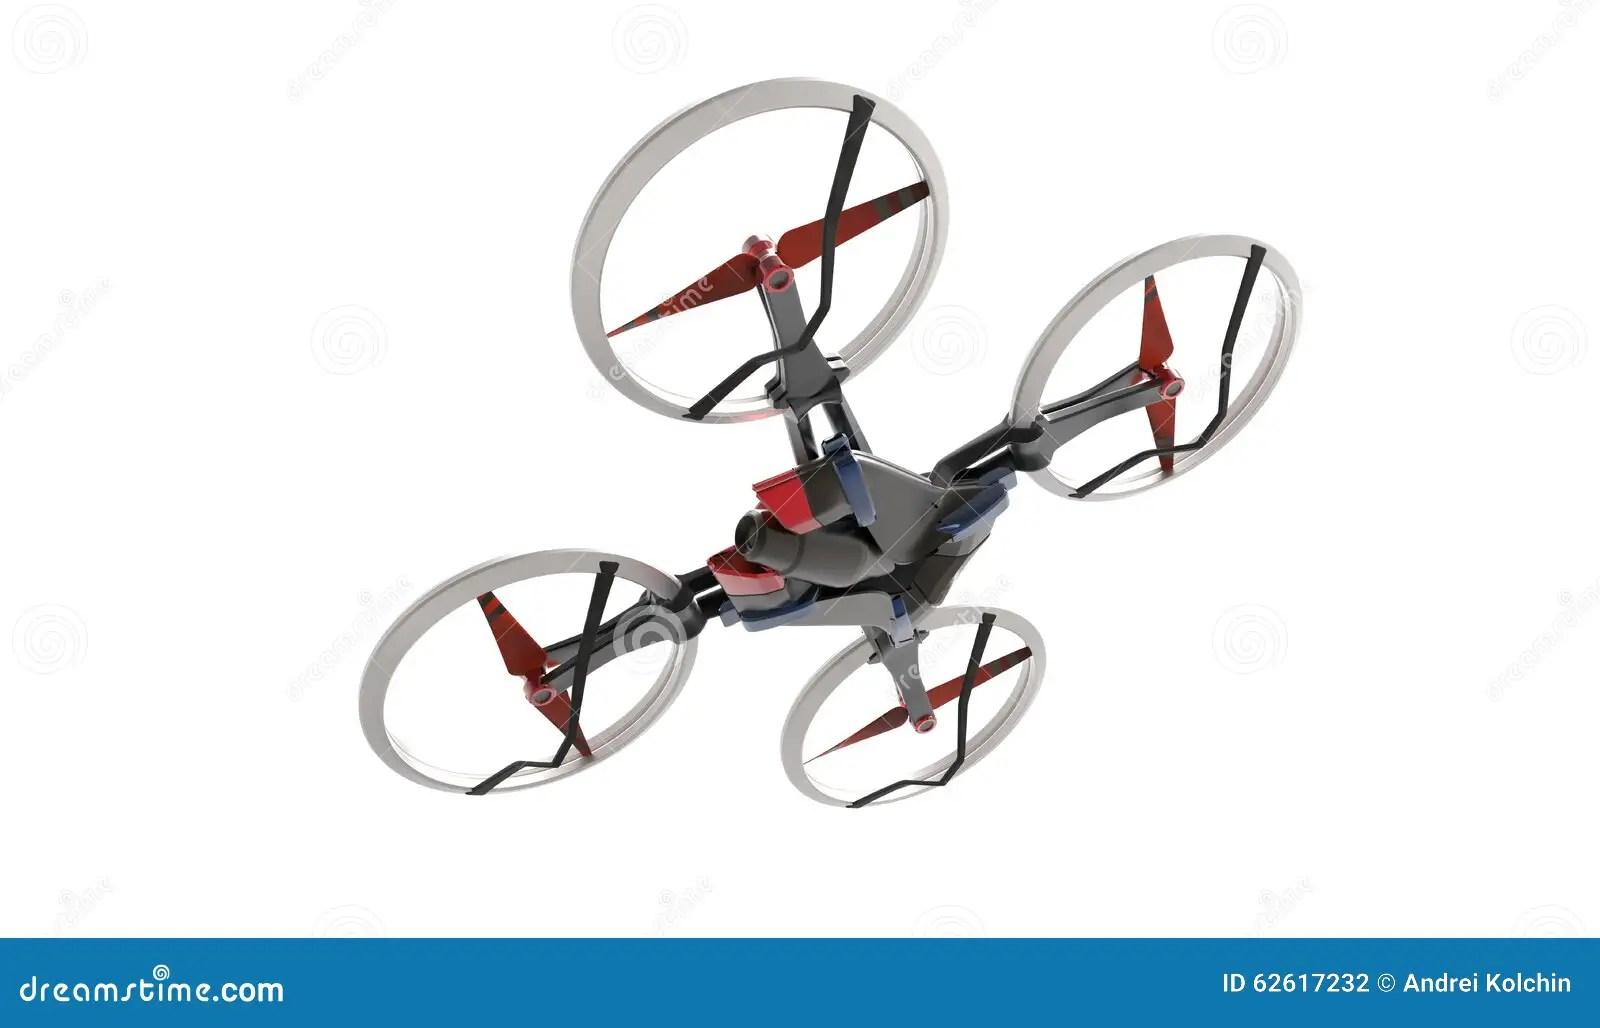 Sci Fi Hi Tech Drone Quadcopter With Remote Control Stock